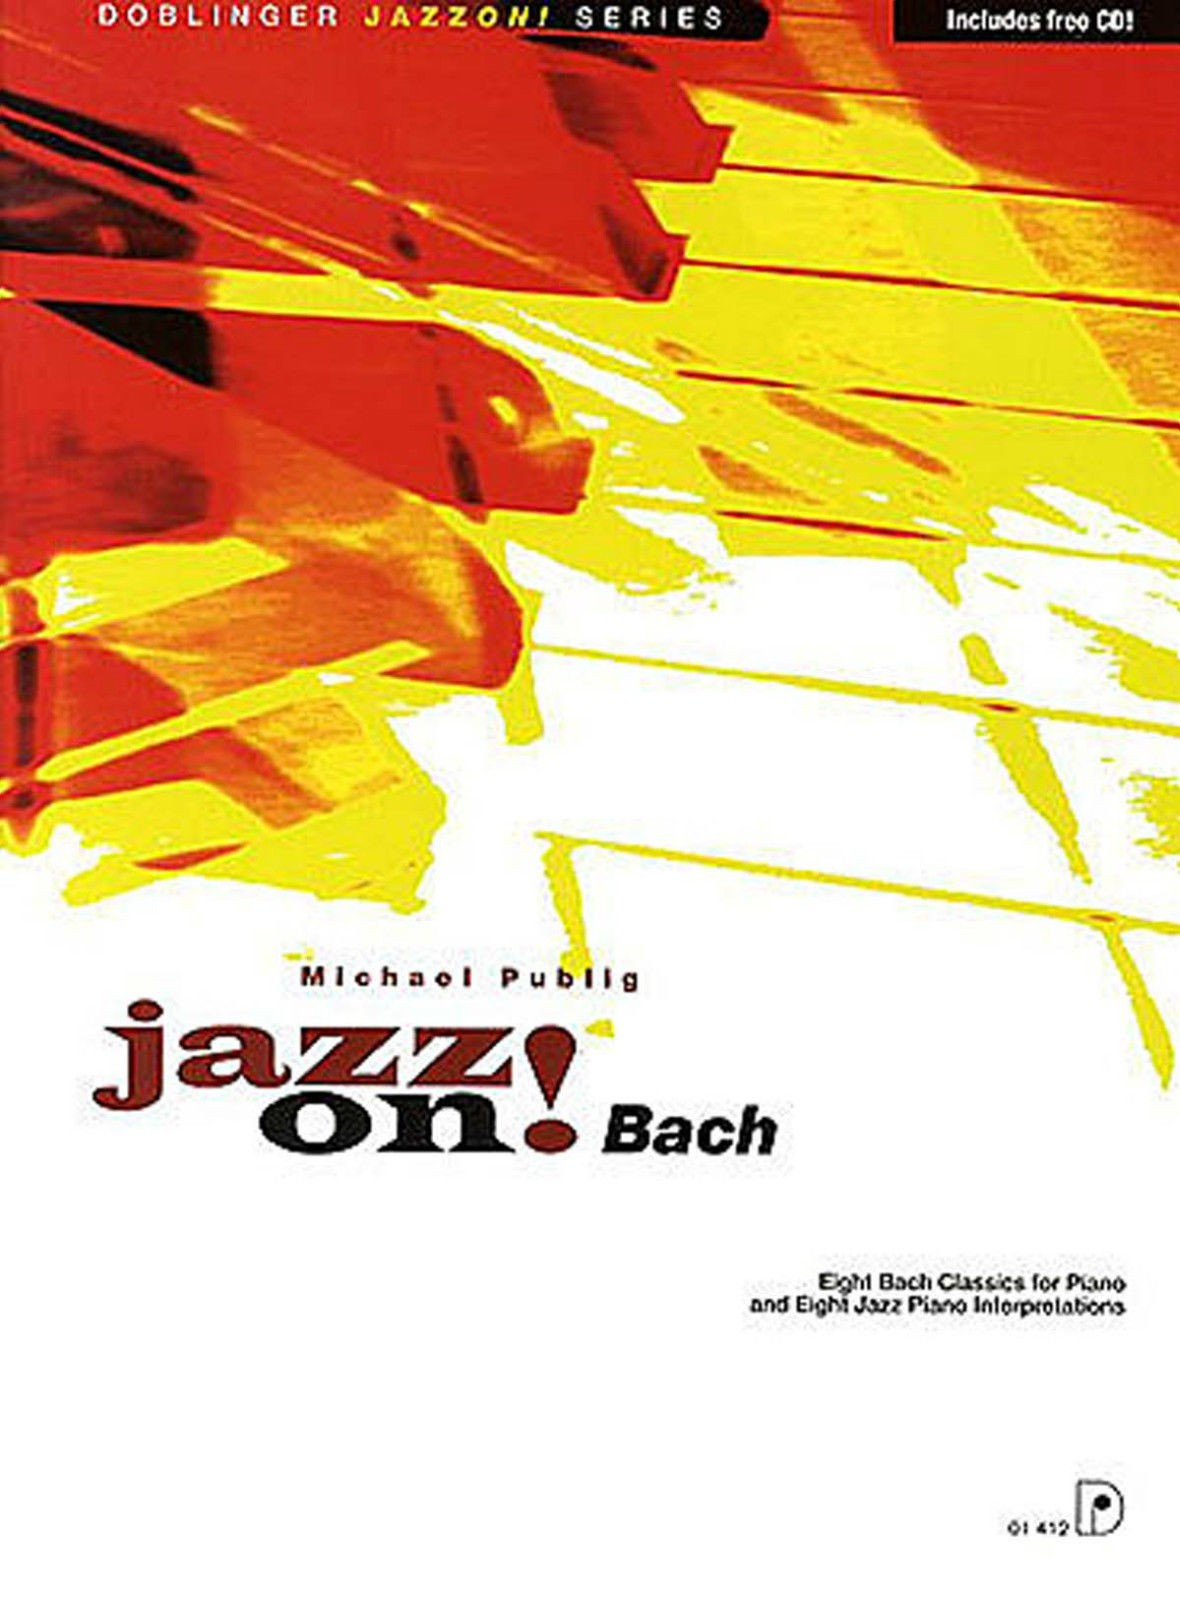 Jazz On! Bach Jazz Piano Interpretations Sheet Music Book CD Advanced Publig B56